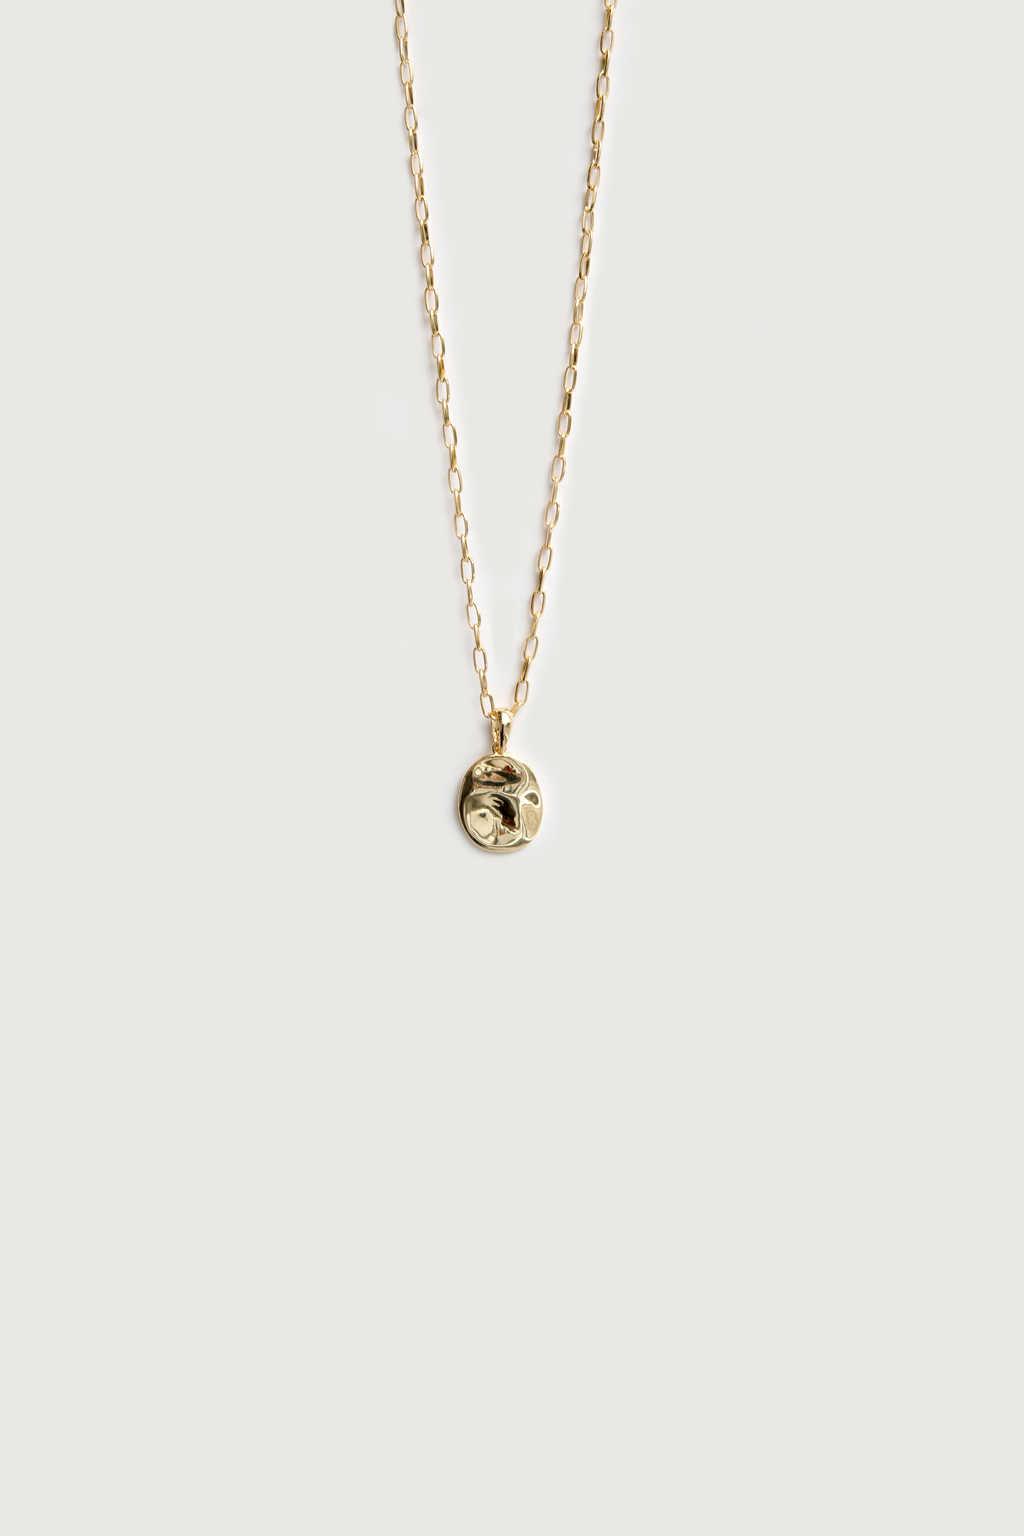 Necklace K004 Gold 2